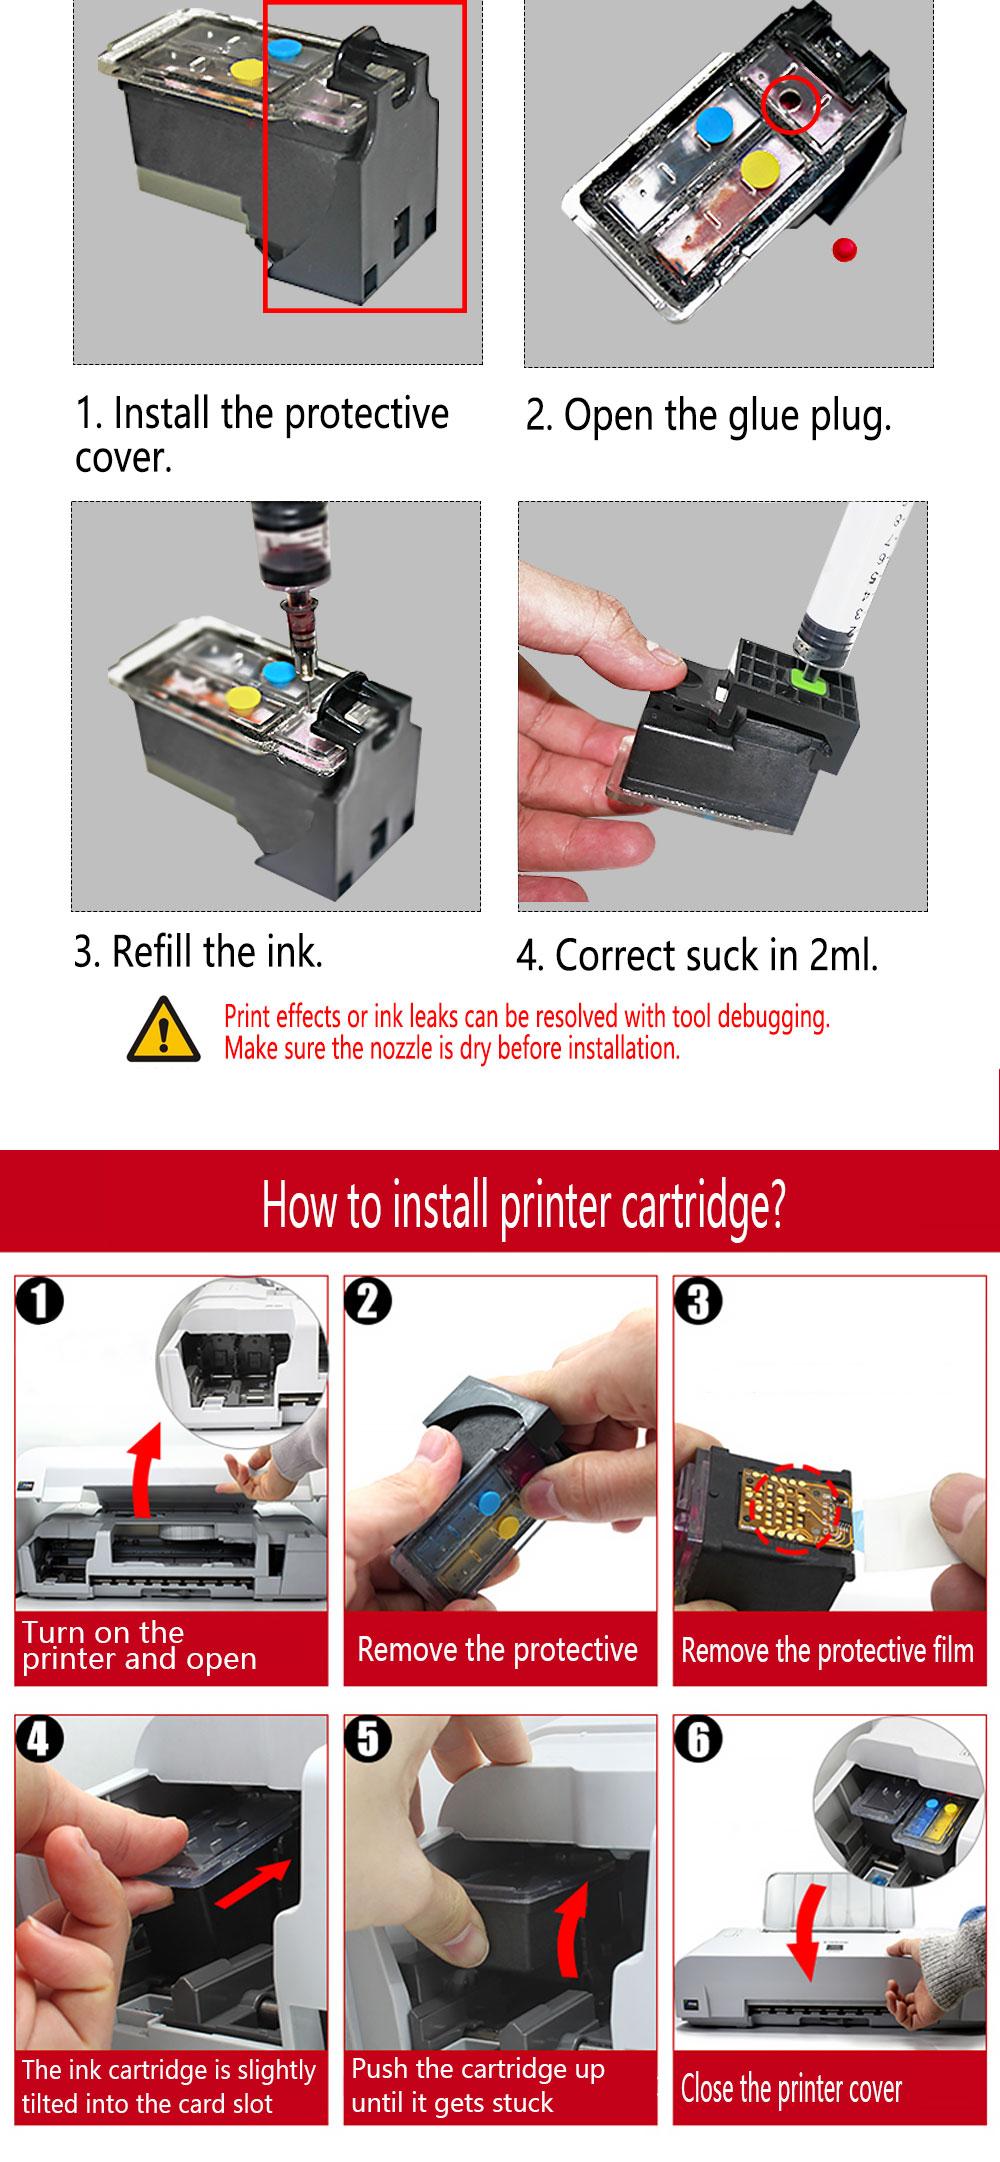 More Than 10,000 Print Pages, Black Refillable Ink Cartridges for HP  Deskjet 2130 1112 3630 3632 3635 Printer